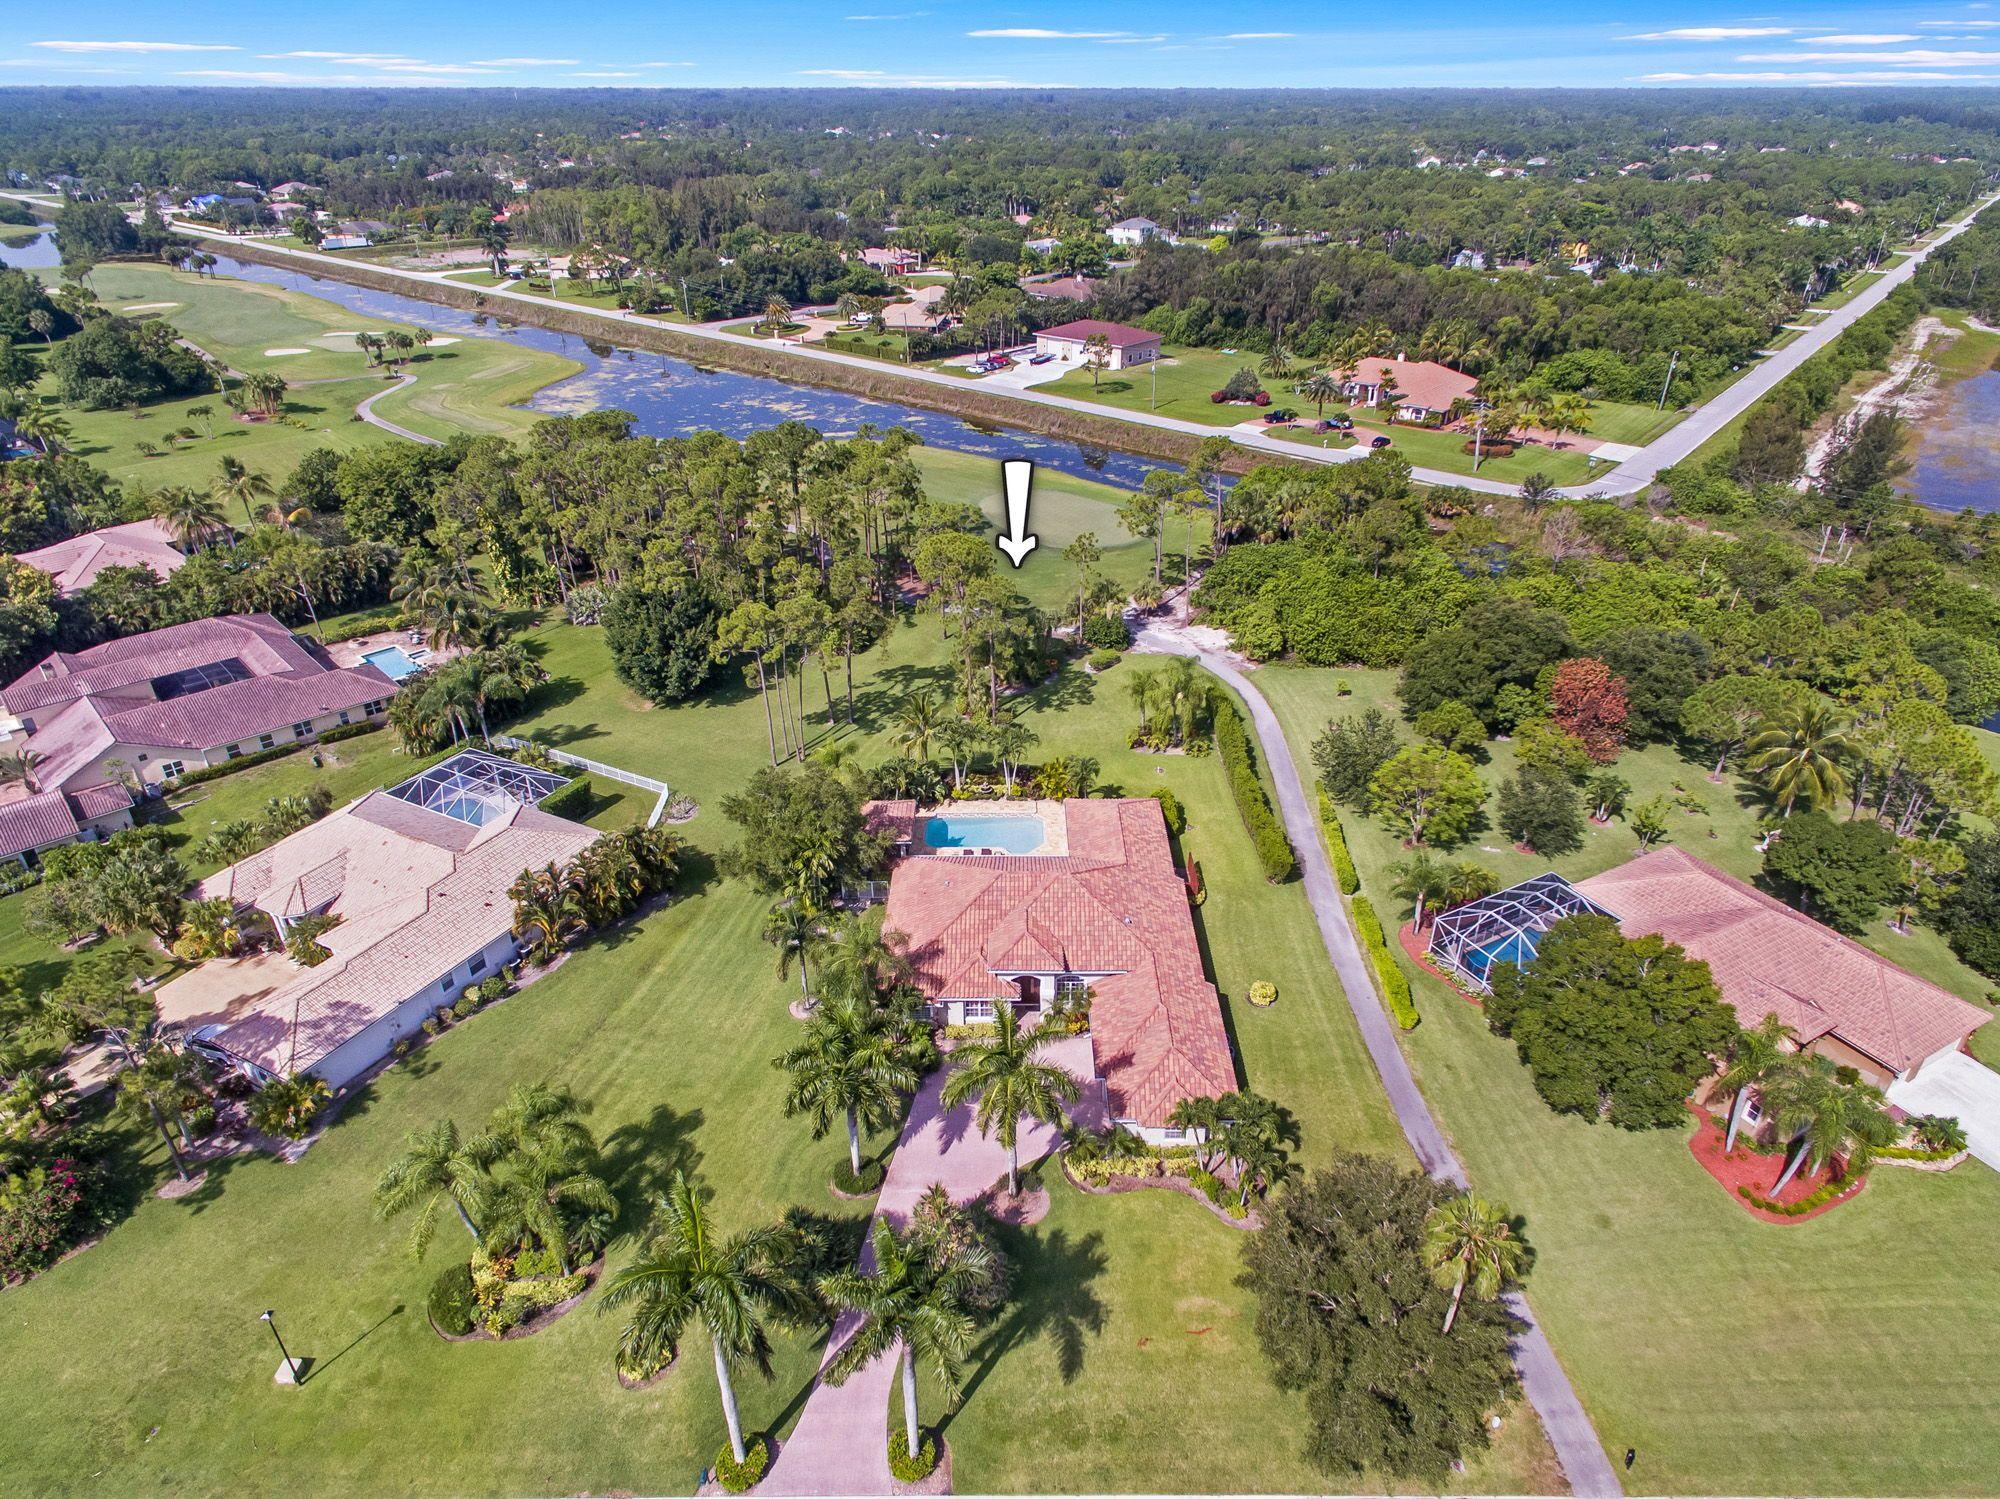 36ad107f02b0c45366653fcedf5d1a49 - Palm Beach Gardens Average Home Price